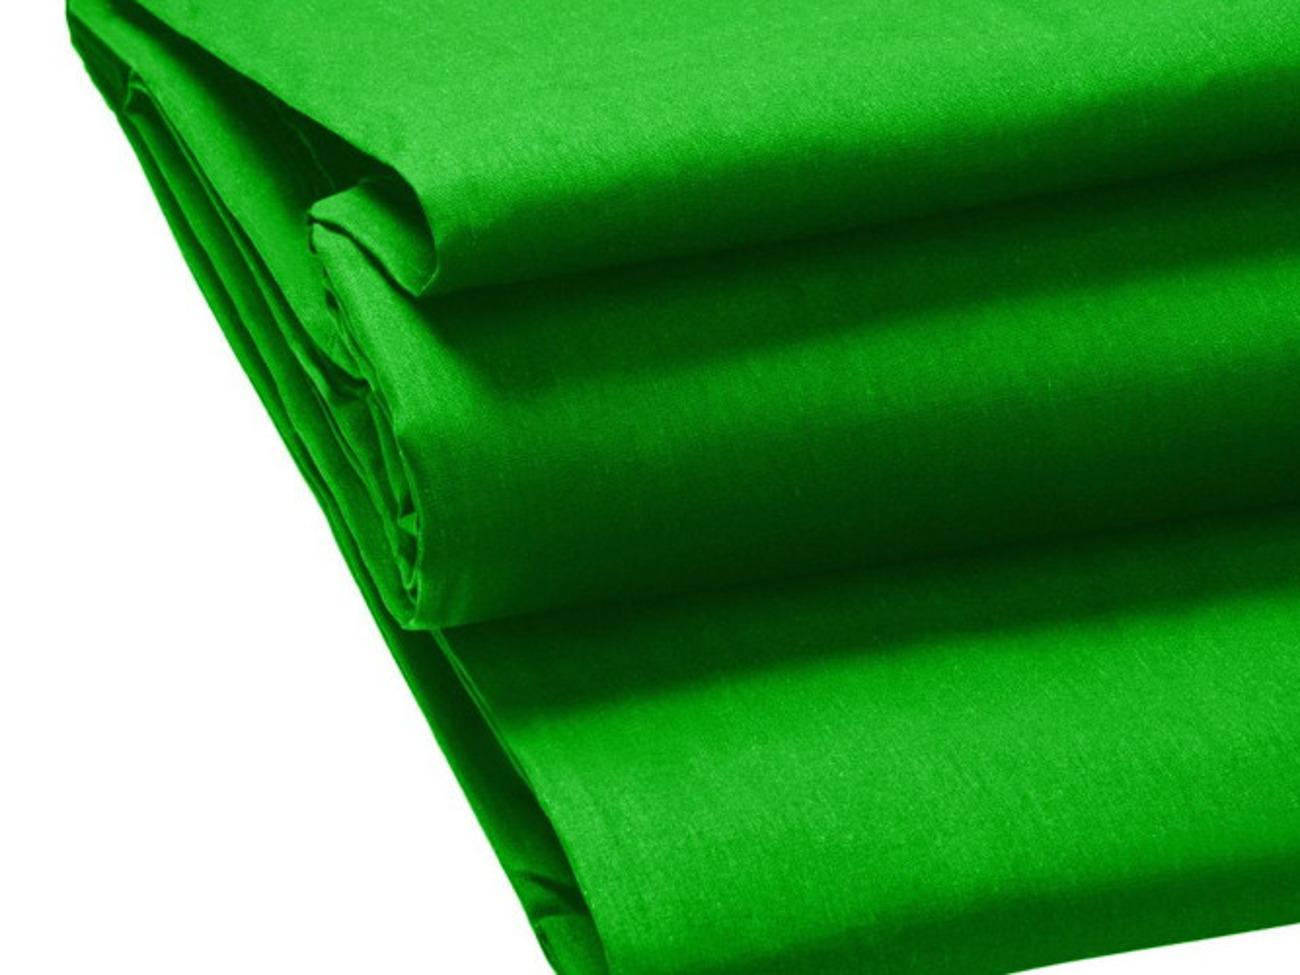 3x6M Green Screen Cloth